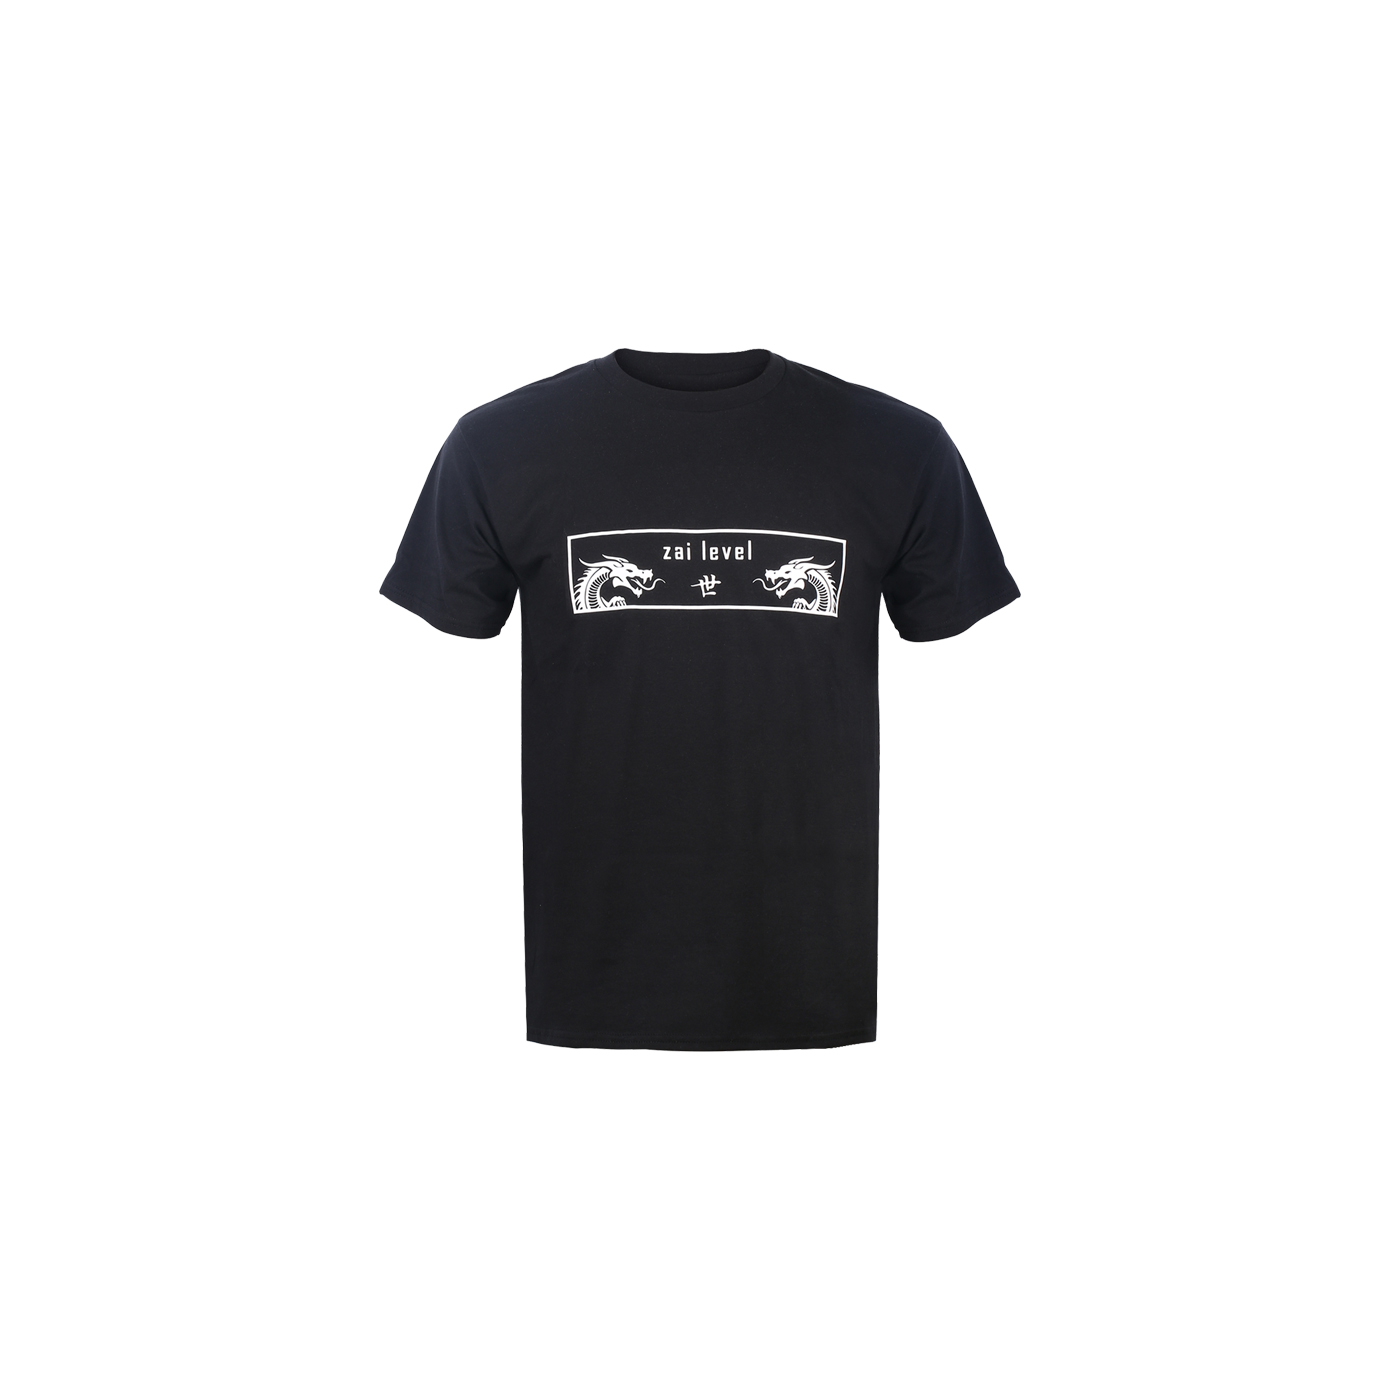 Chinese T-shirt Dragon Front.jpg